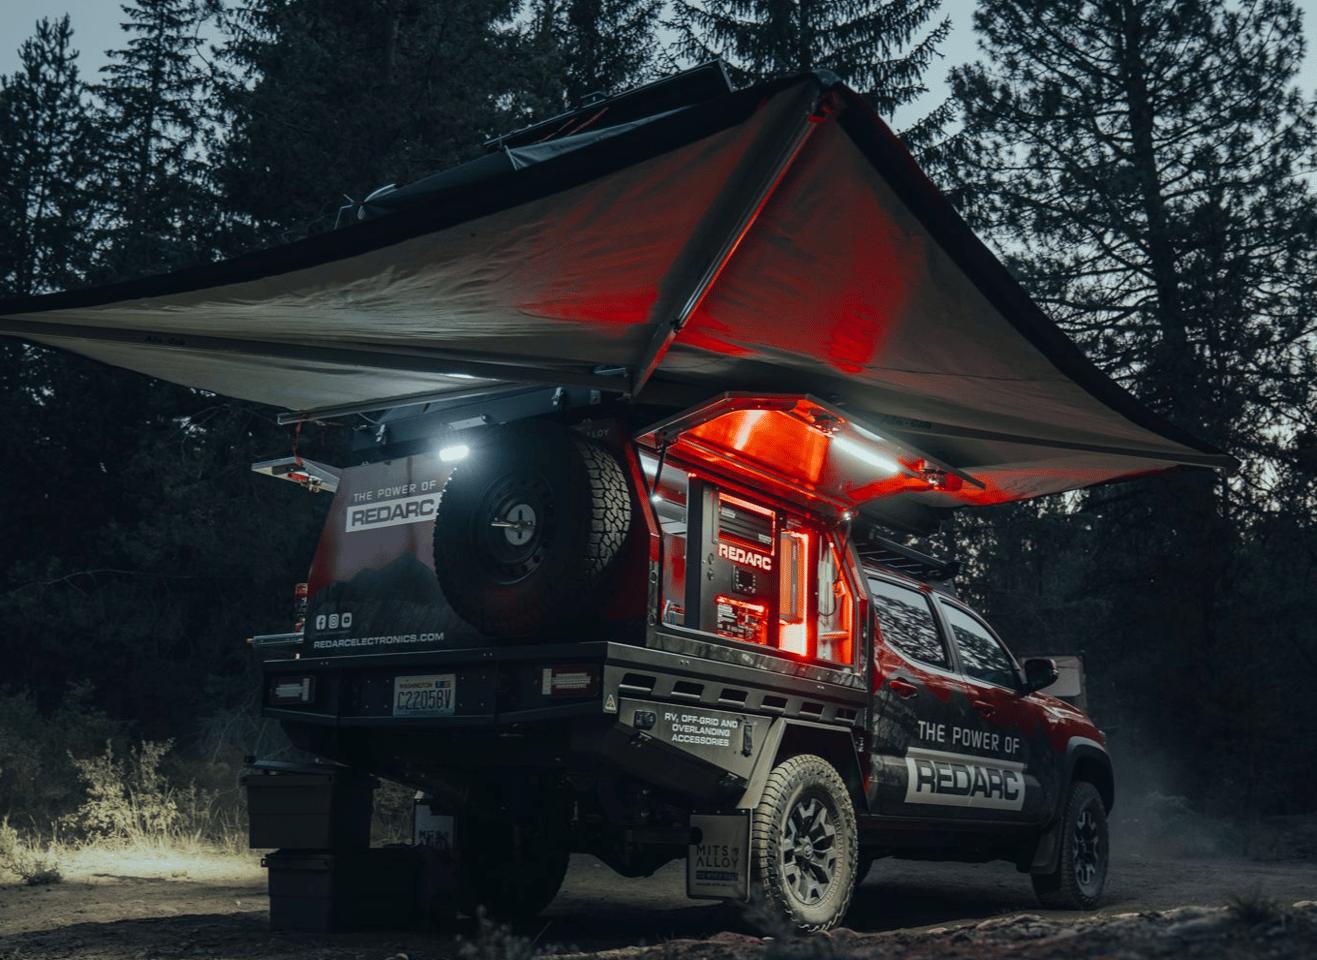 The 270-degree Alu-Cab awning provides shade